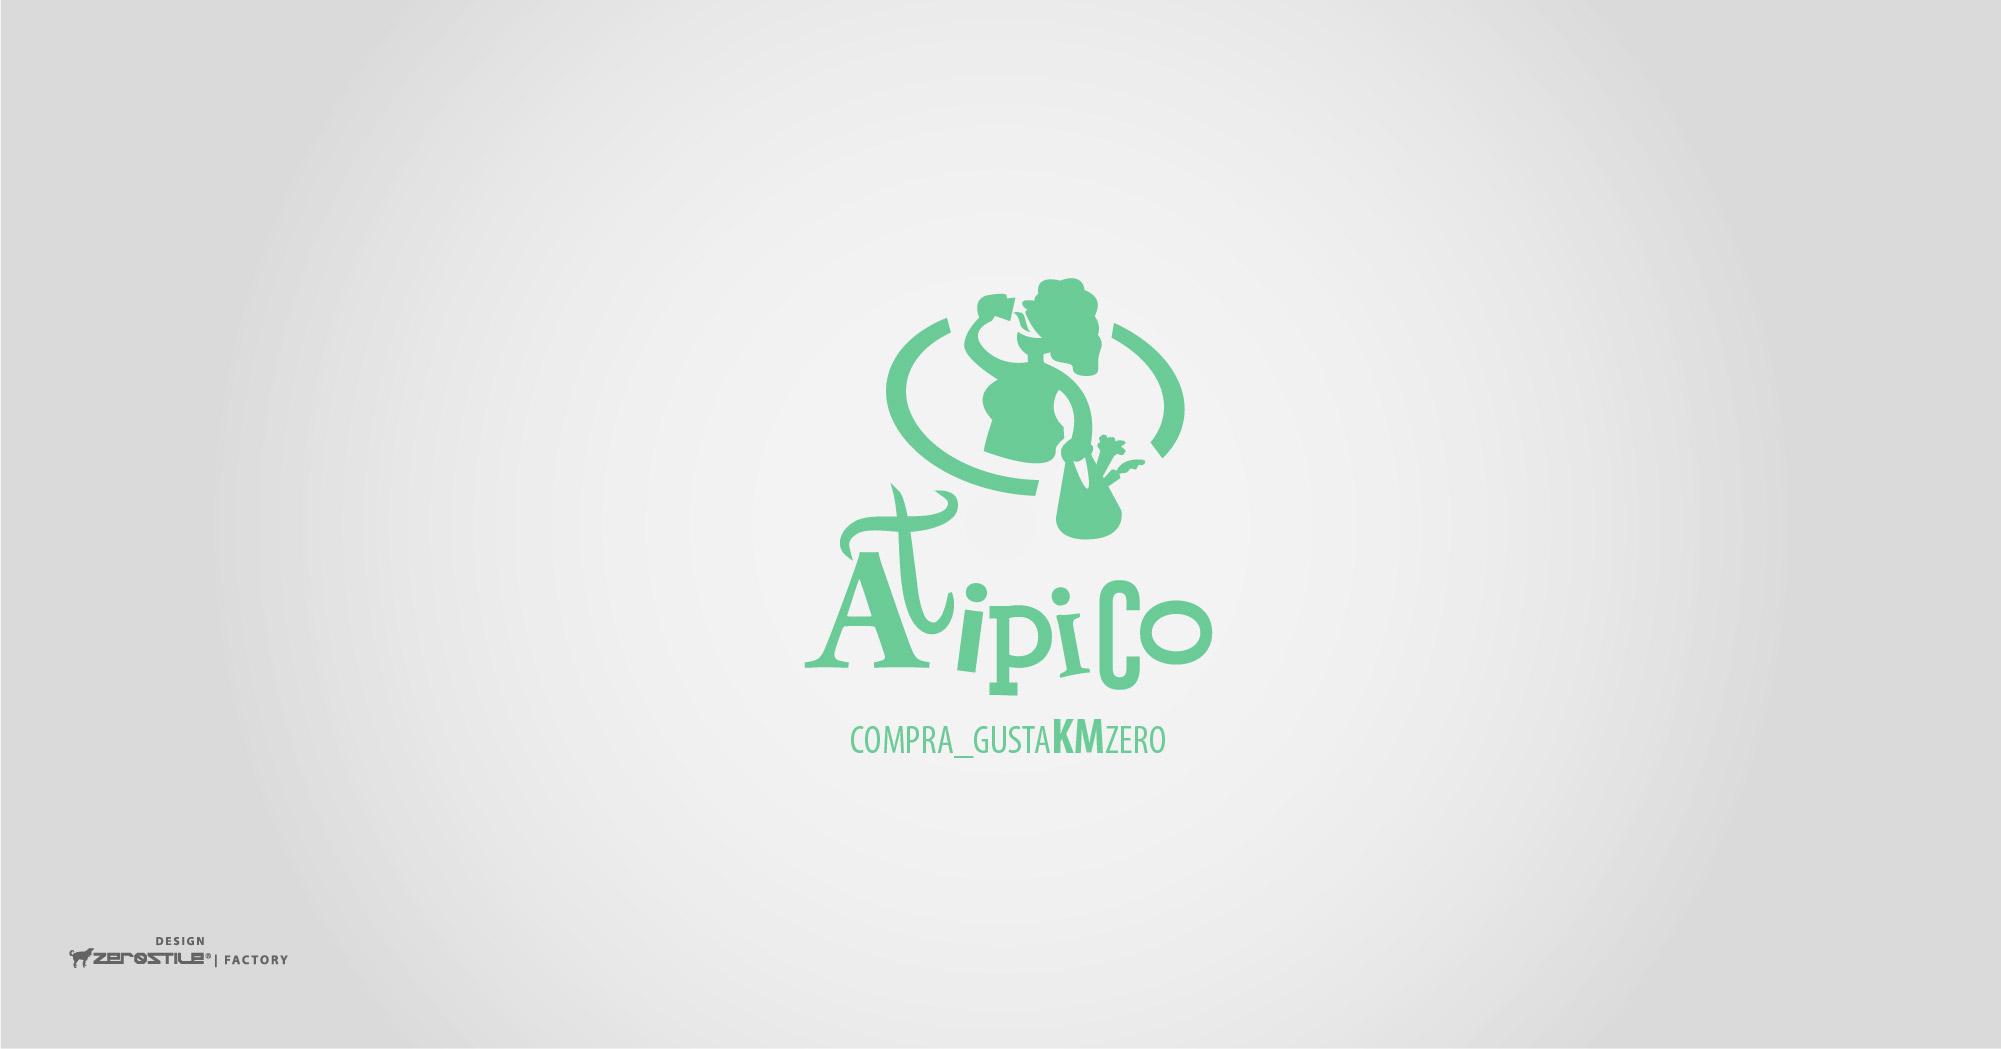 Logo_Atipico_Porfolio Gallery_Porfolio Gallery